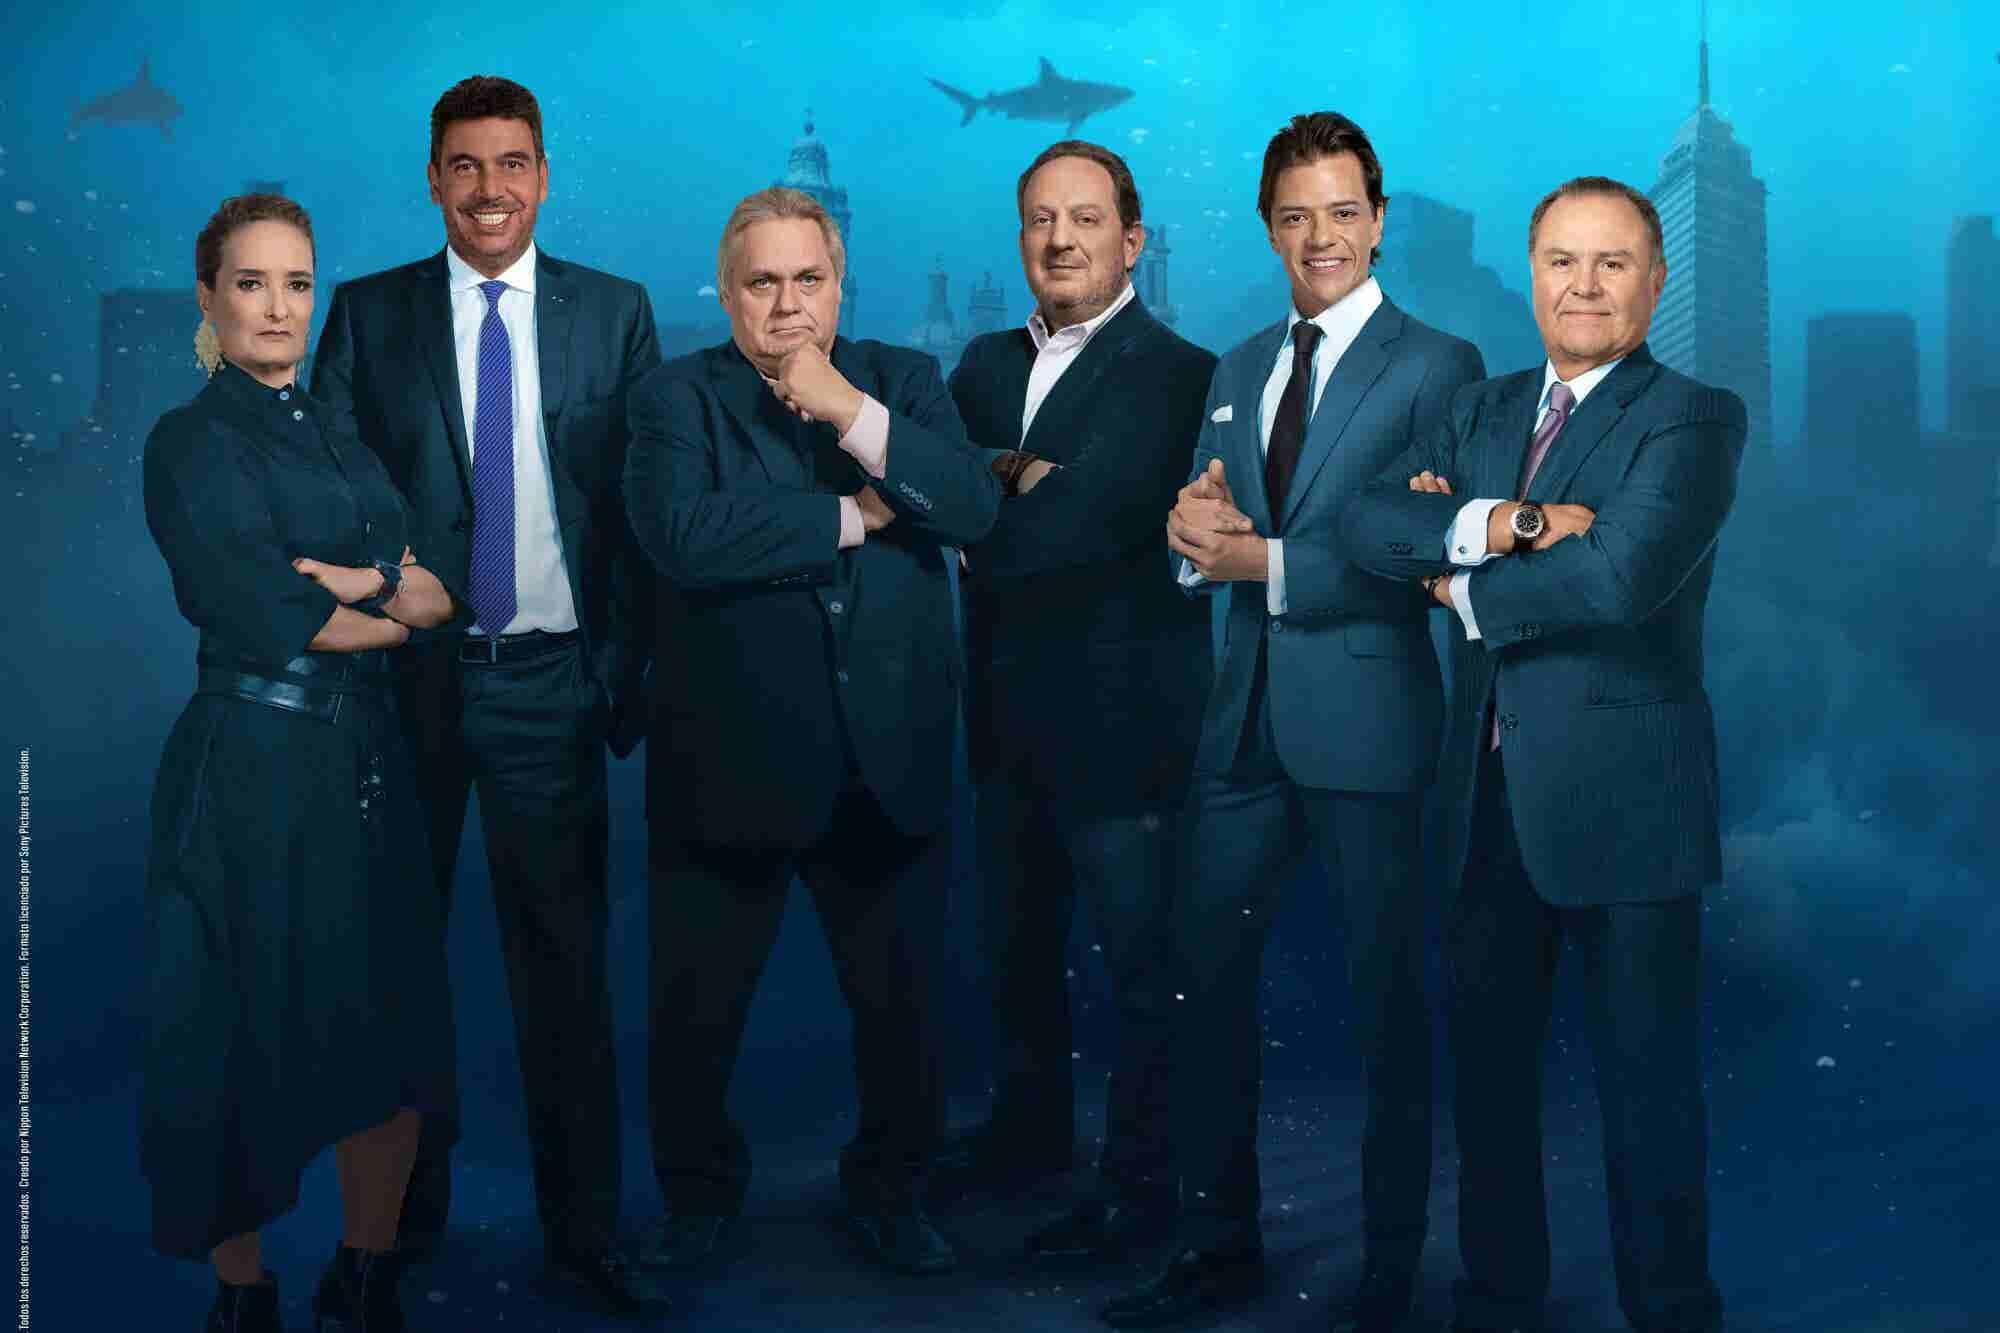 Cómo inscribir tu idea a la siguiente temporada de Shark Tank México